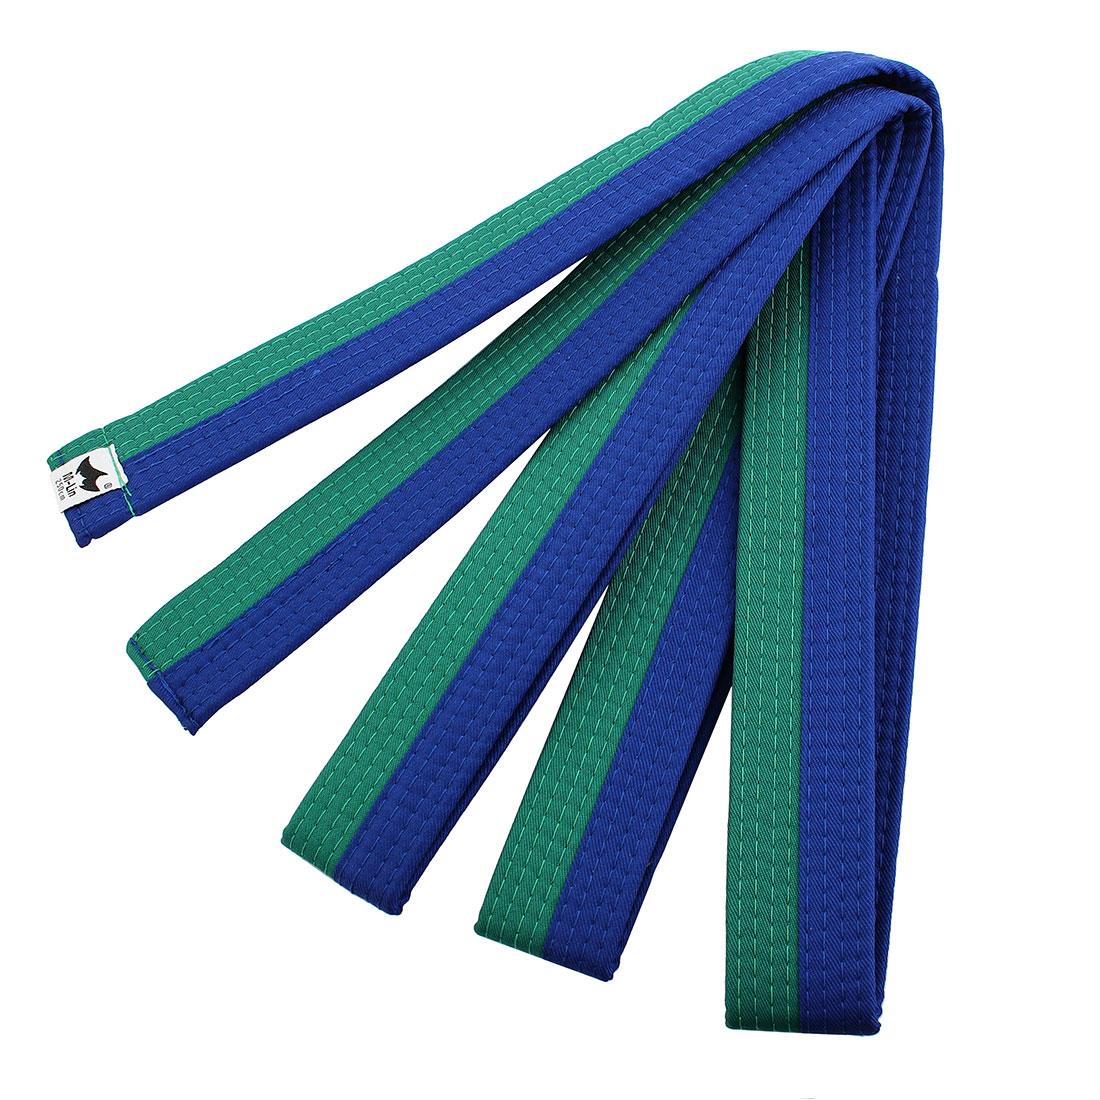 Solid Sporty Rank Judo Taekwondo Belt Martial Arts Karate Band Green Blue